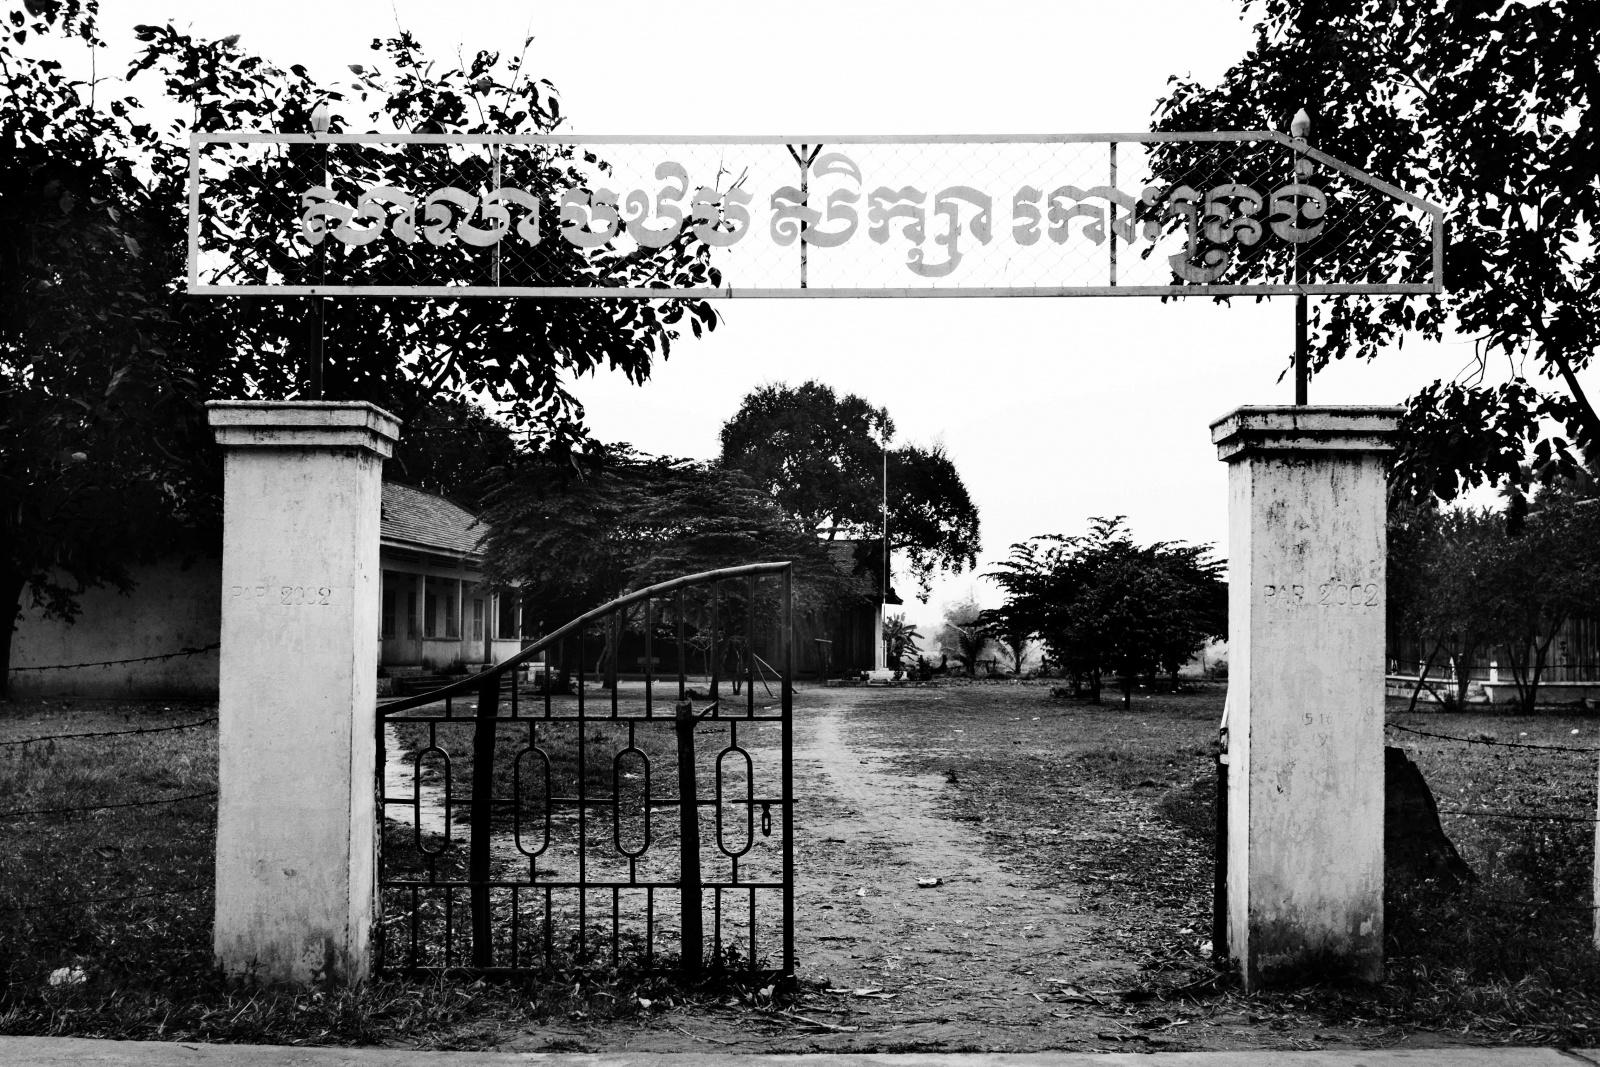 CAMBOGIA: Education in Cambodia